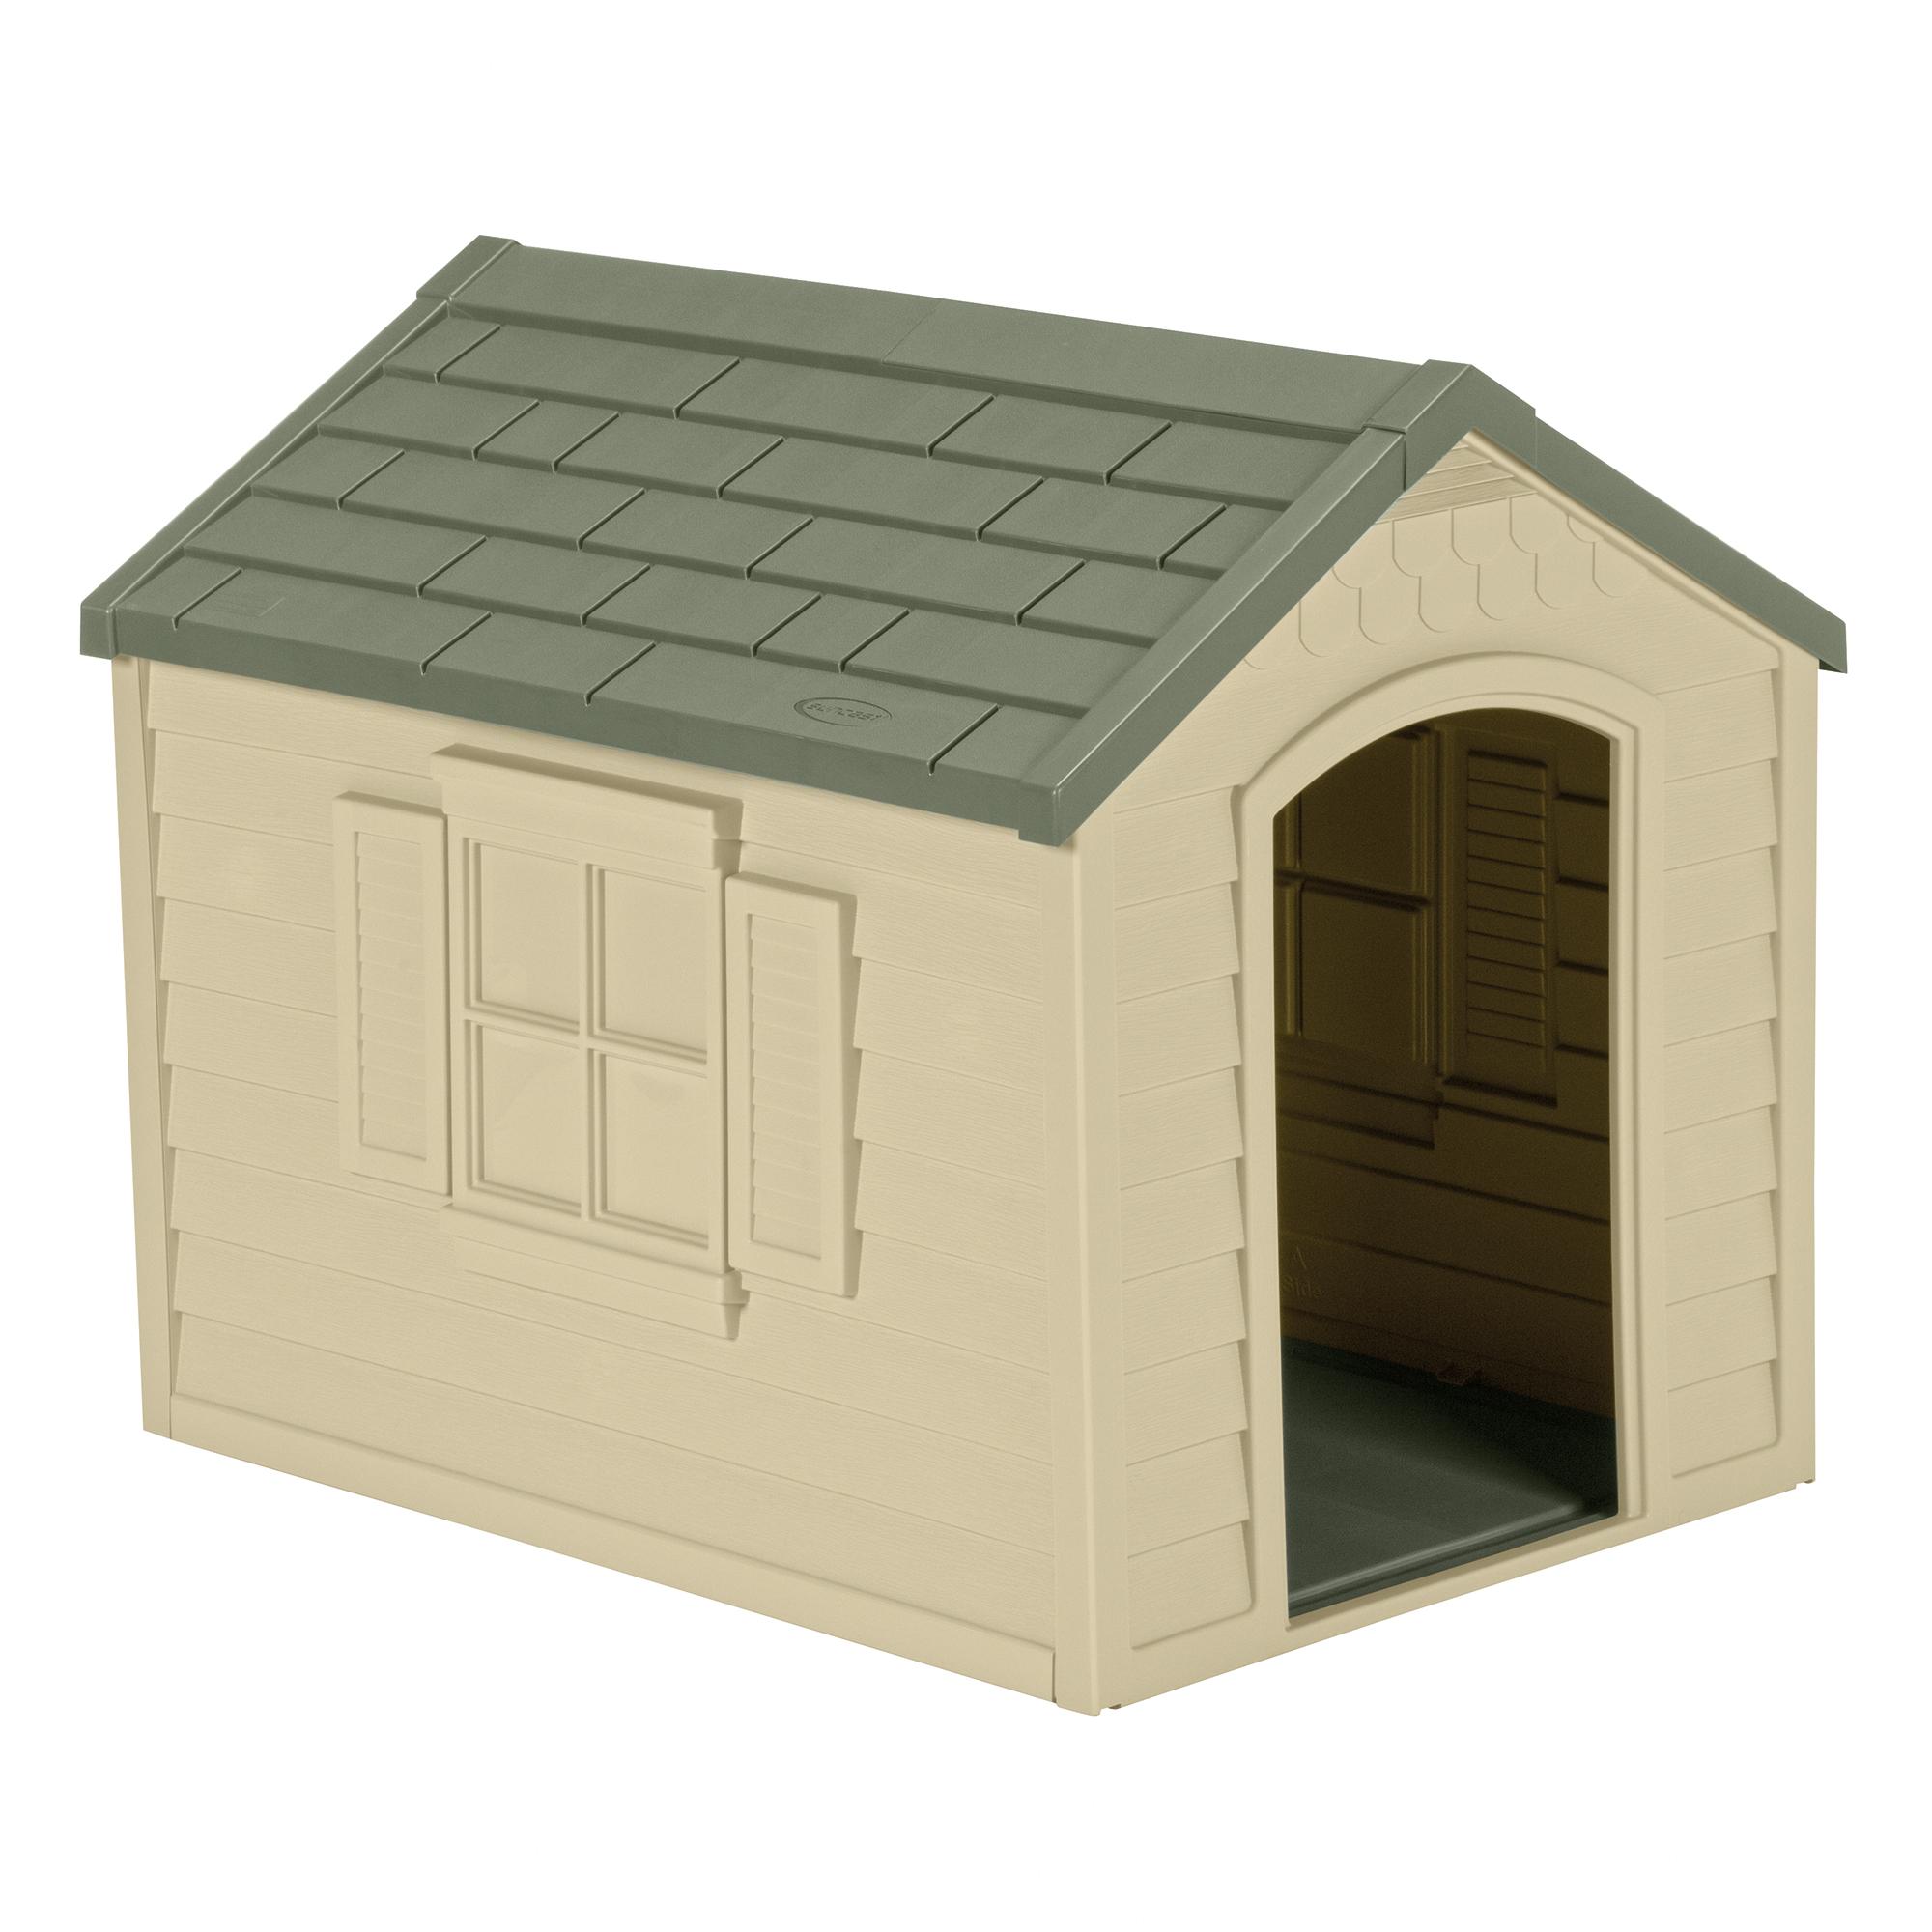 Suncast Deluxe Dog House, DH250